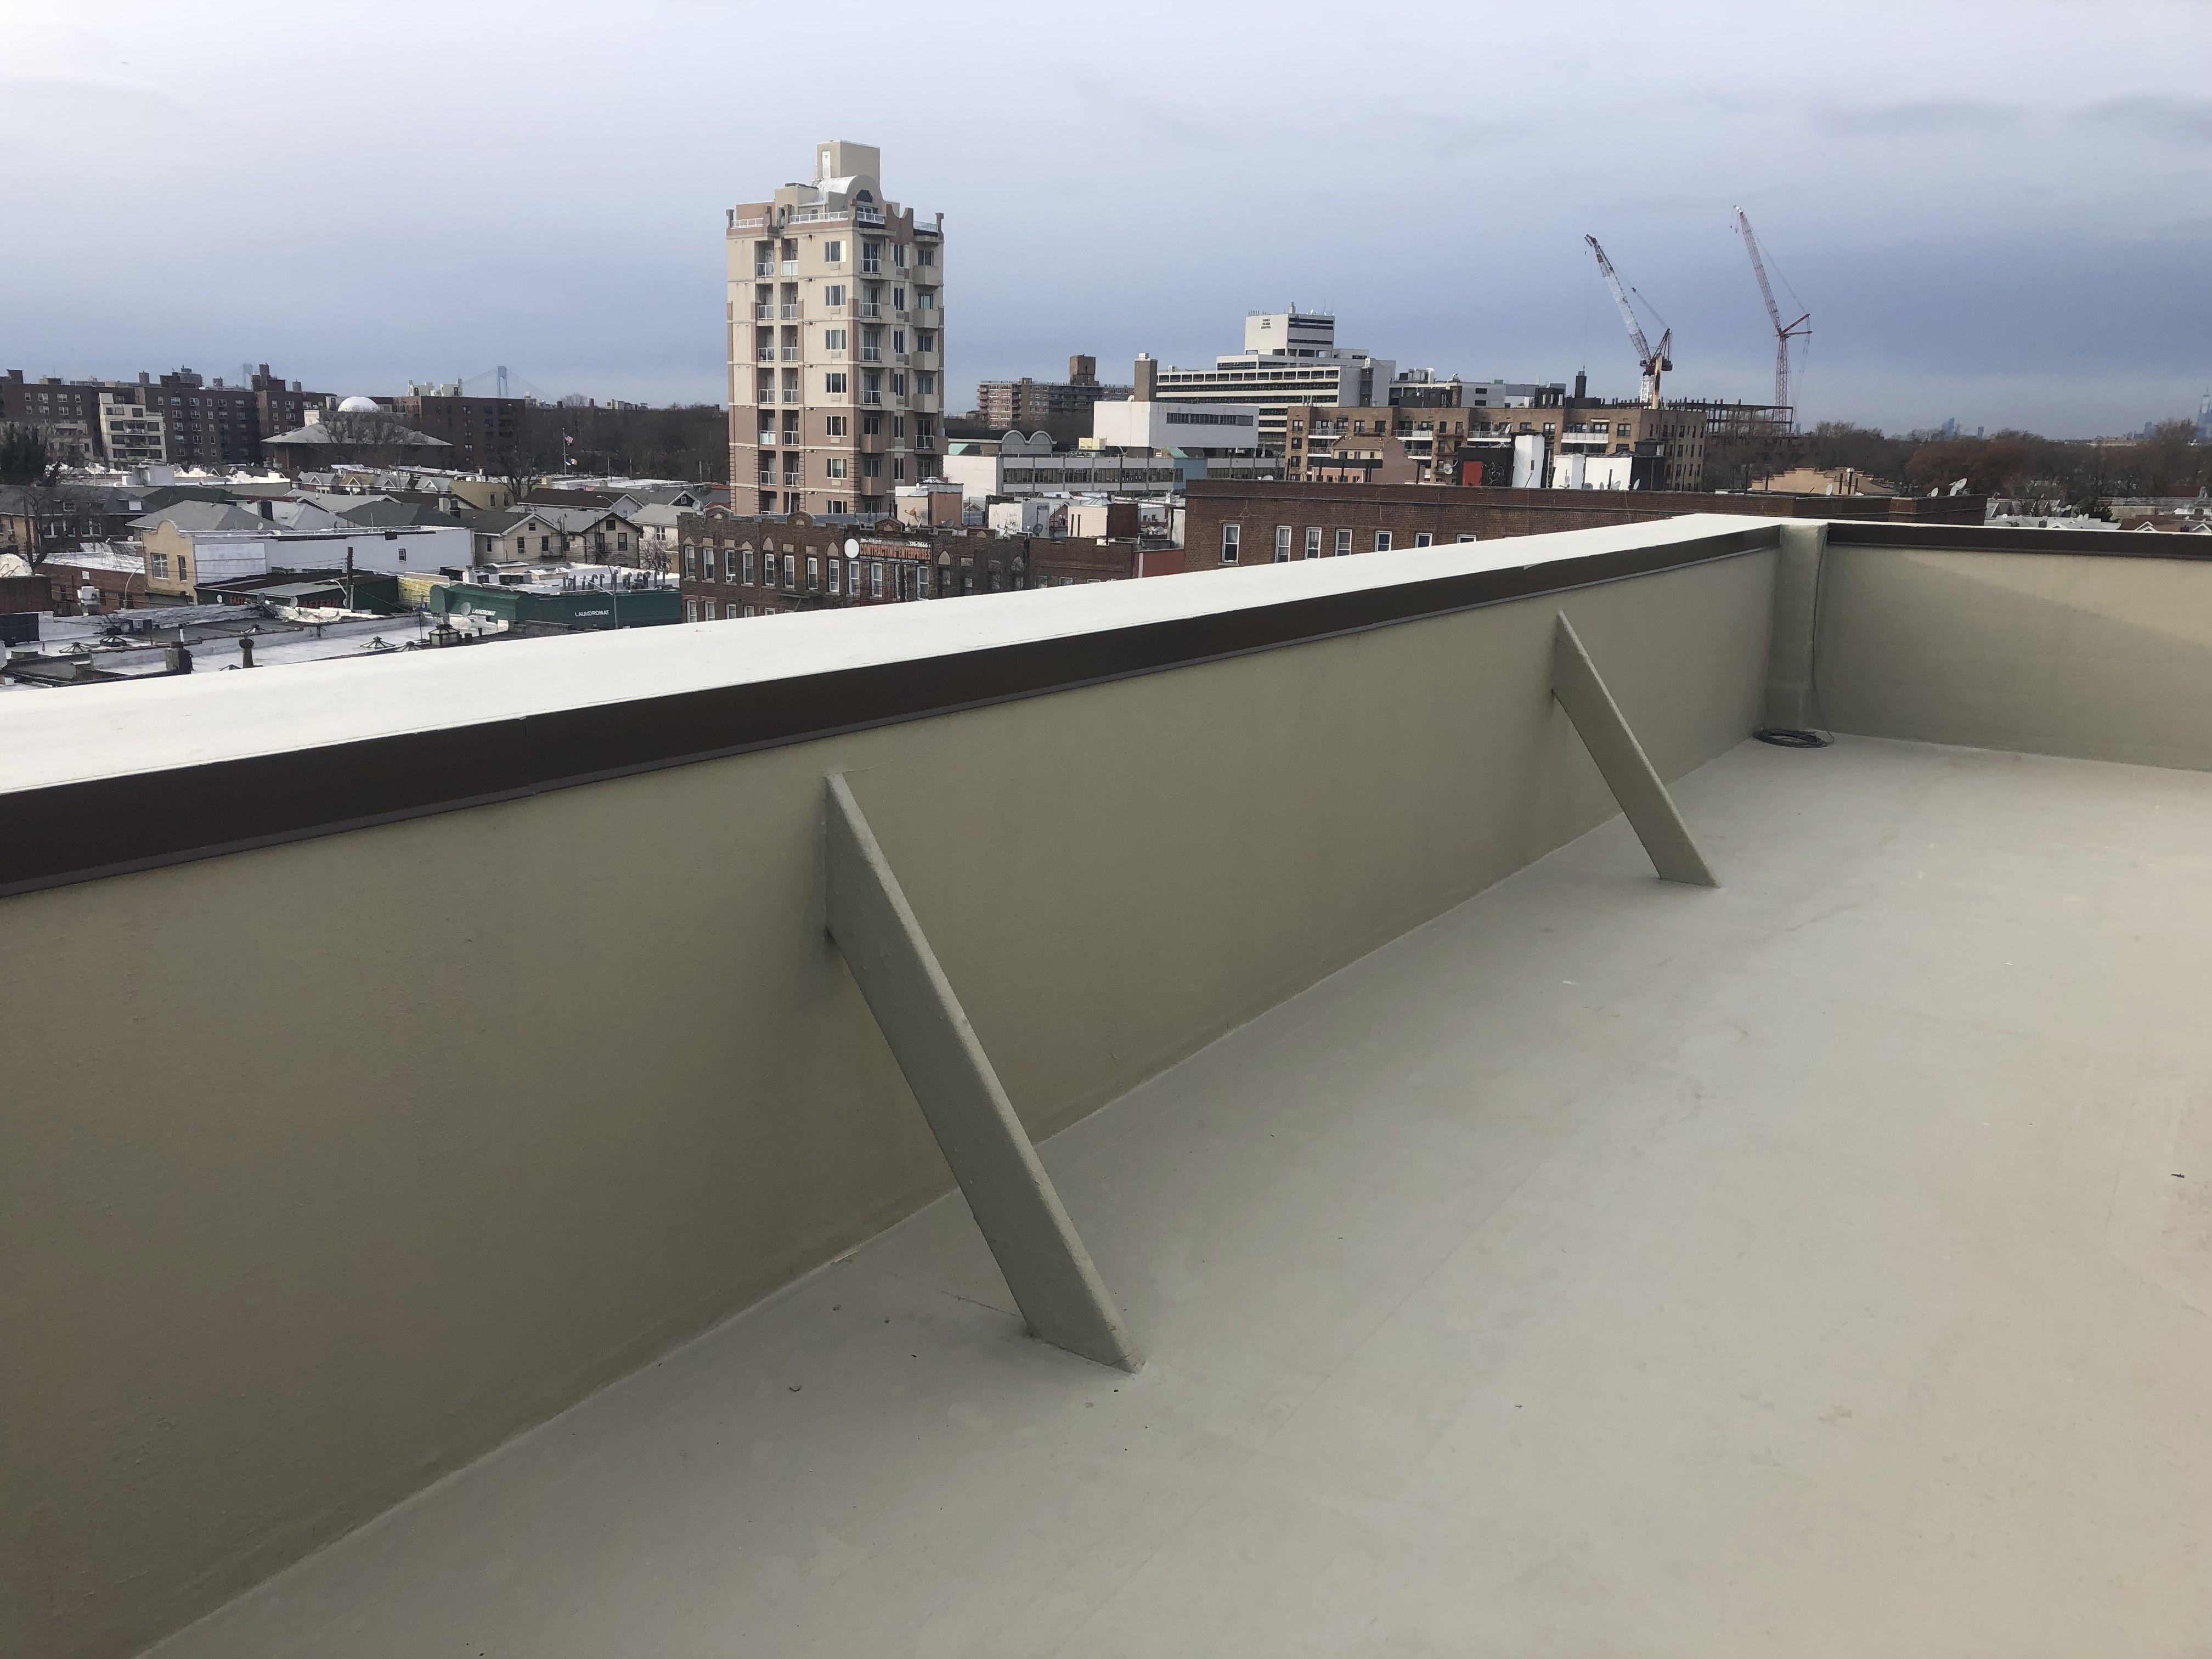 Brooklyn Condo Roof Renovation Roof Renovation Flat Roof Roof